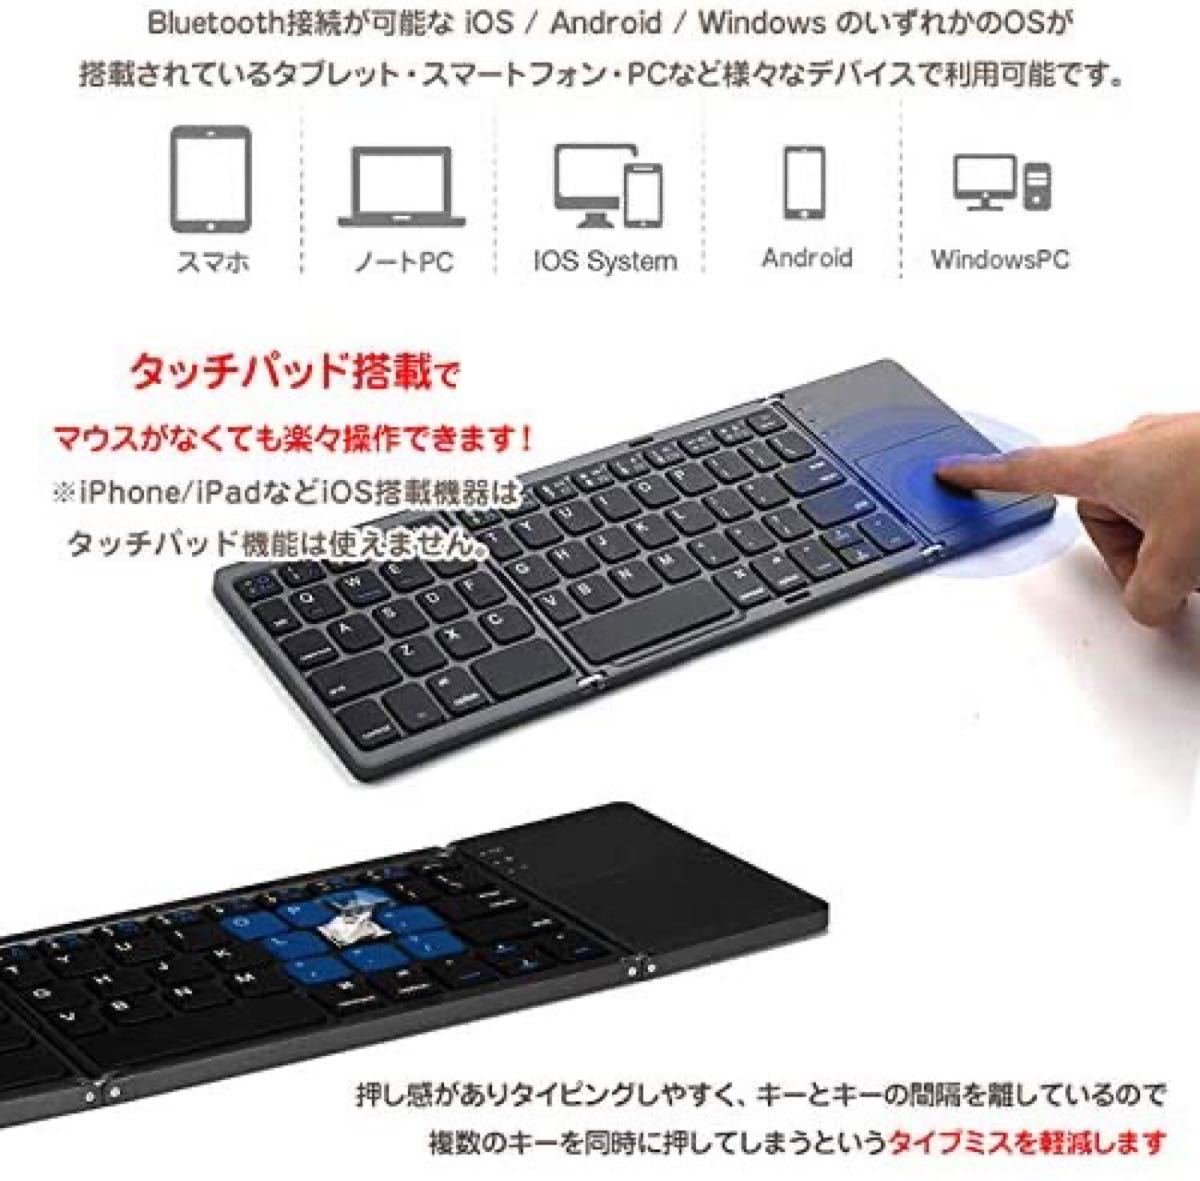 Bluetooth三つ折りコンパクトキーボード&スマホ/タブレットスタンドセット ワイヤレスキーボード Apple Android